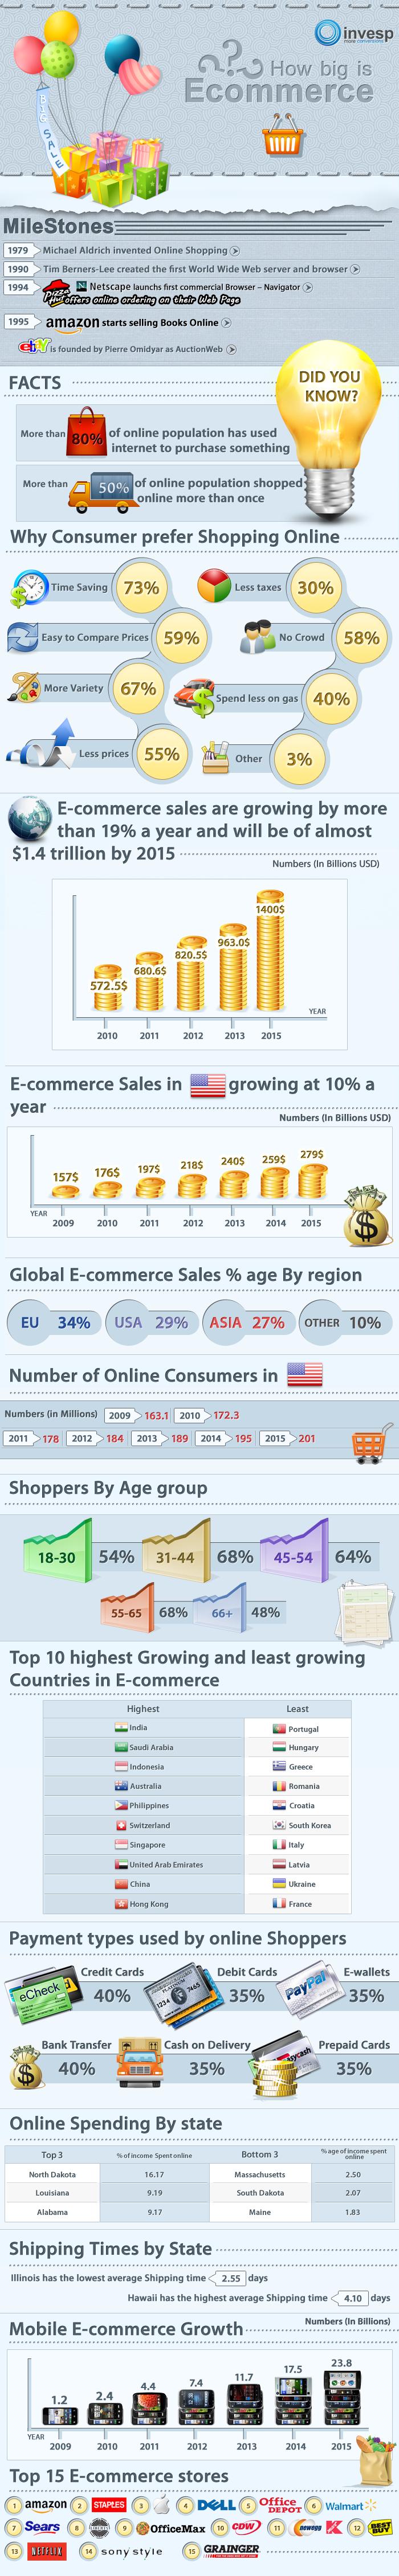 How big is ecommerce